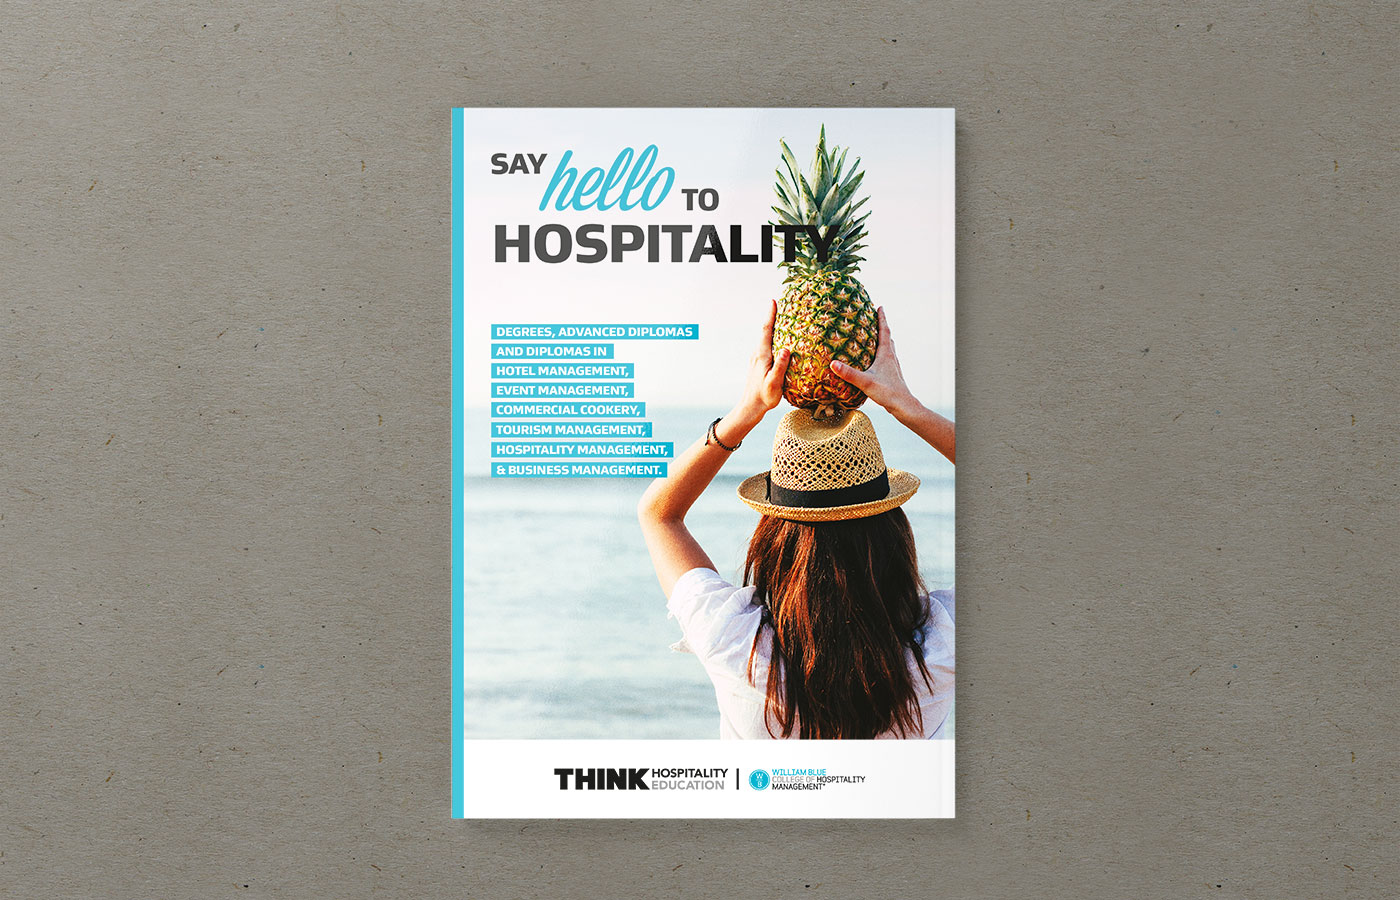 Think-Education-Design-Finished-Art-Brochure-Hospitality